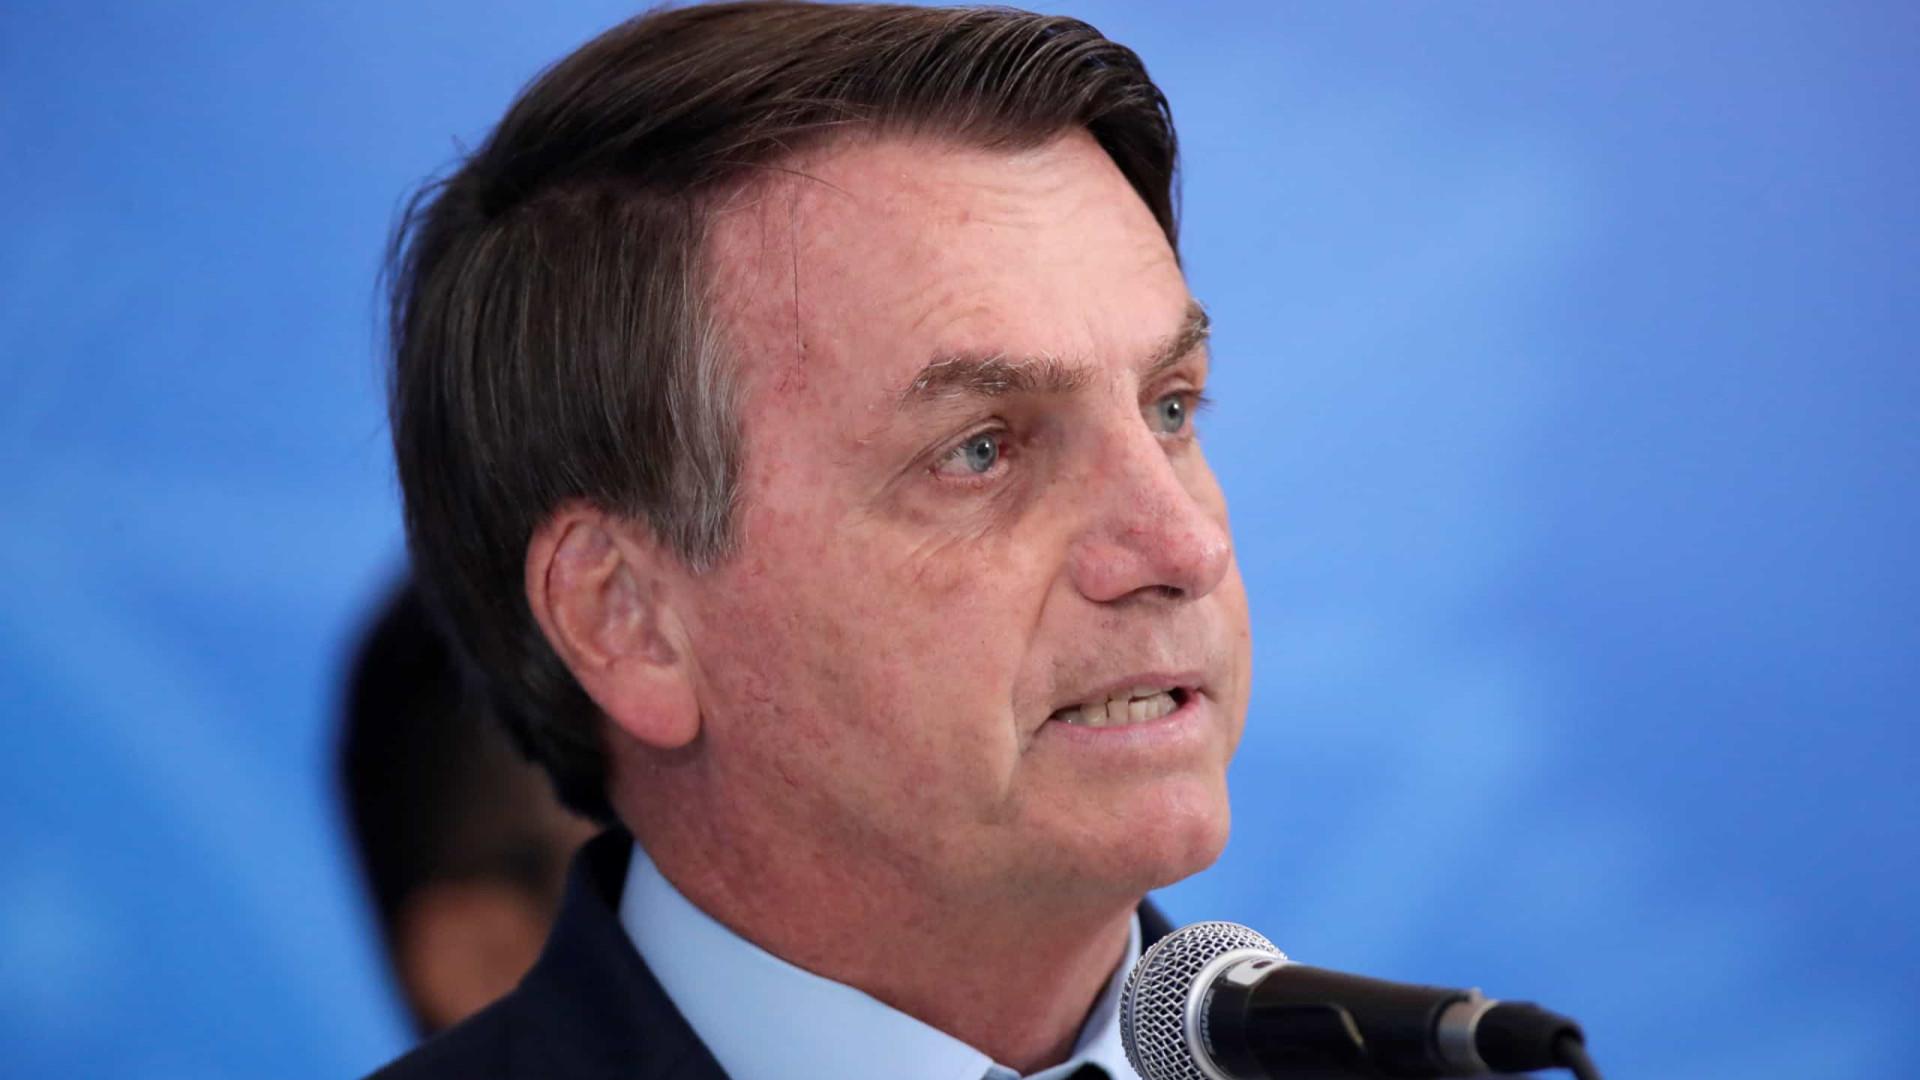 Ministro quer julgar chapa de Bolsonaro 'o quanto antes'